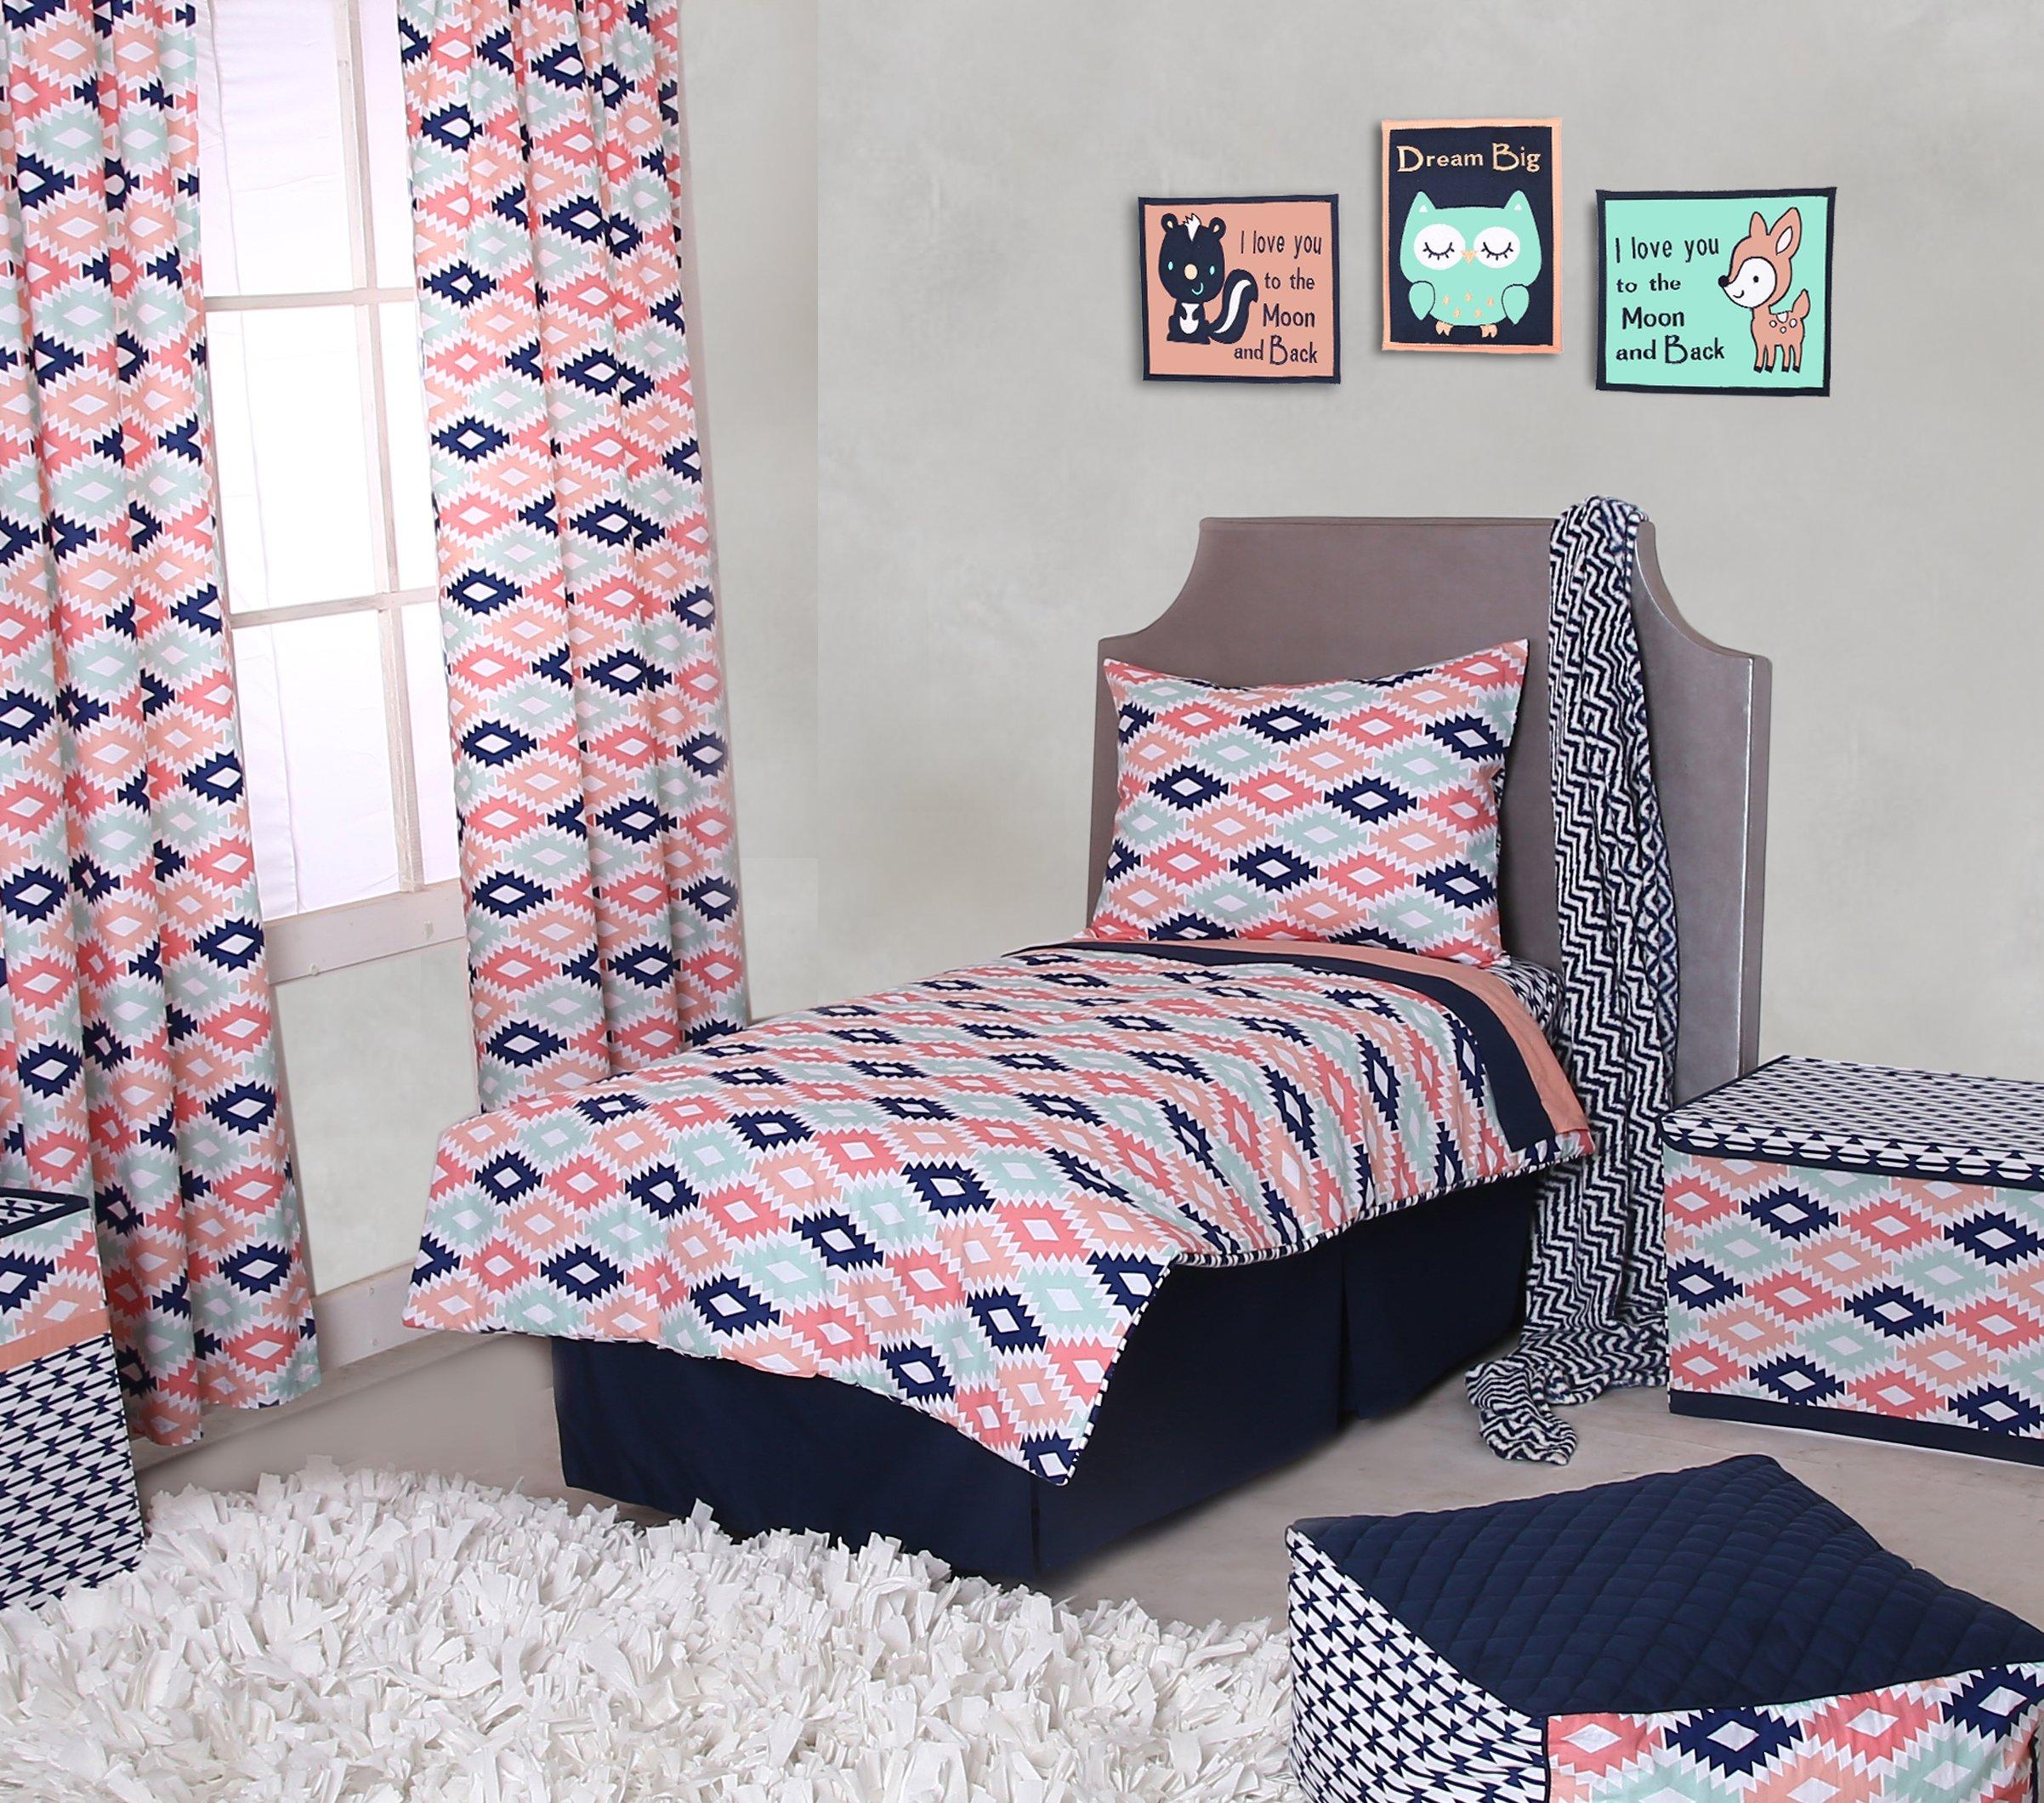 Bacati Emma Aztec 4 Piece Toddler Bedding Set, Coral/Mint/Navy